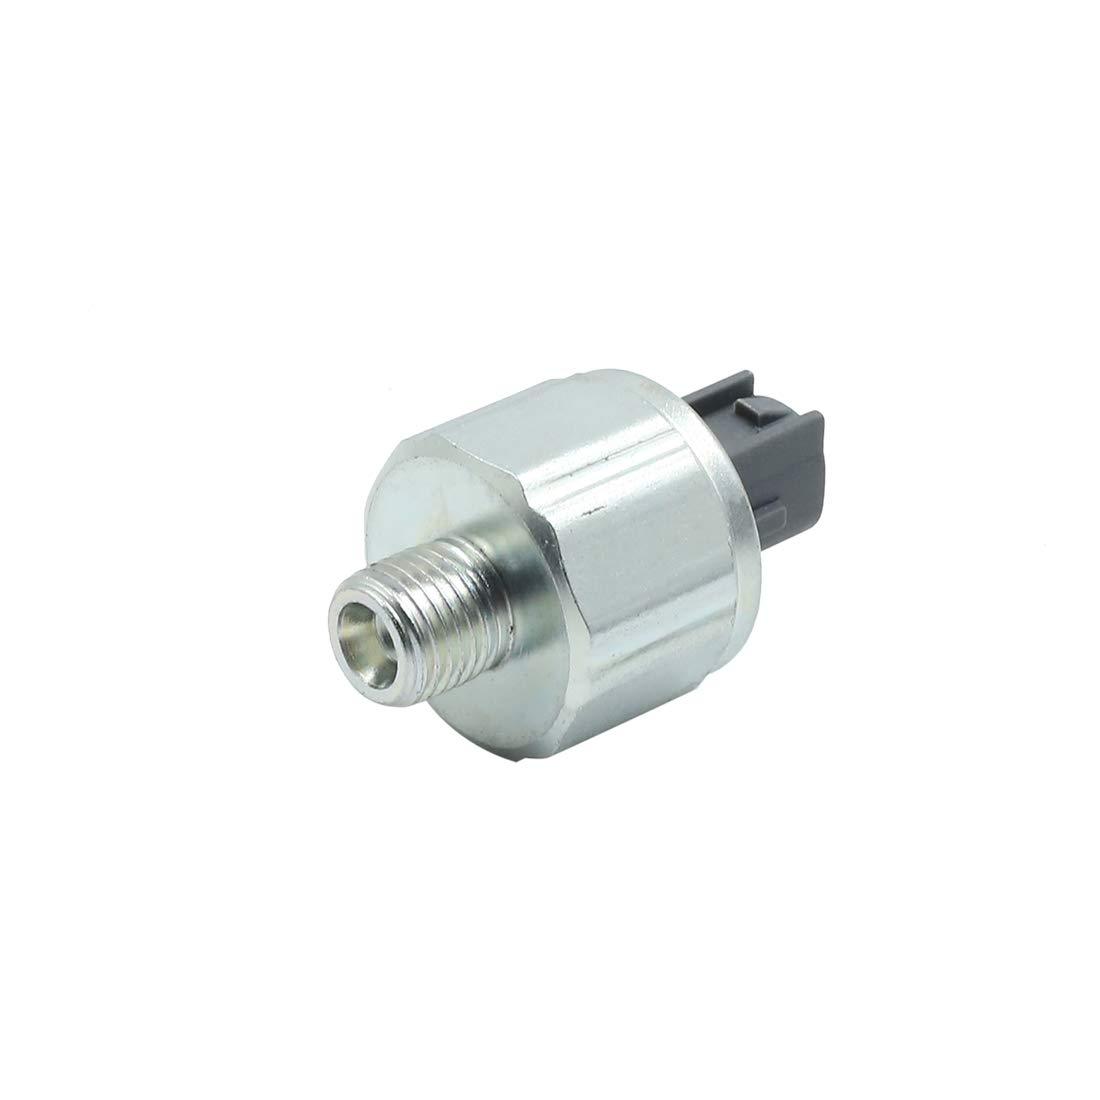 X AUTOHAUX Car 2 Terminals Engine Knock Sensor DC 12V 22060-2Y000 for Nissan Altima 2002-2004